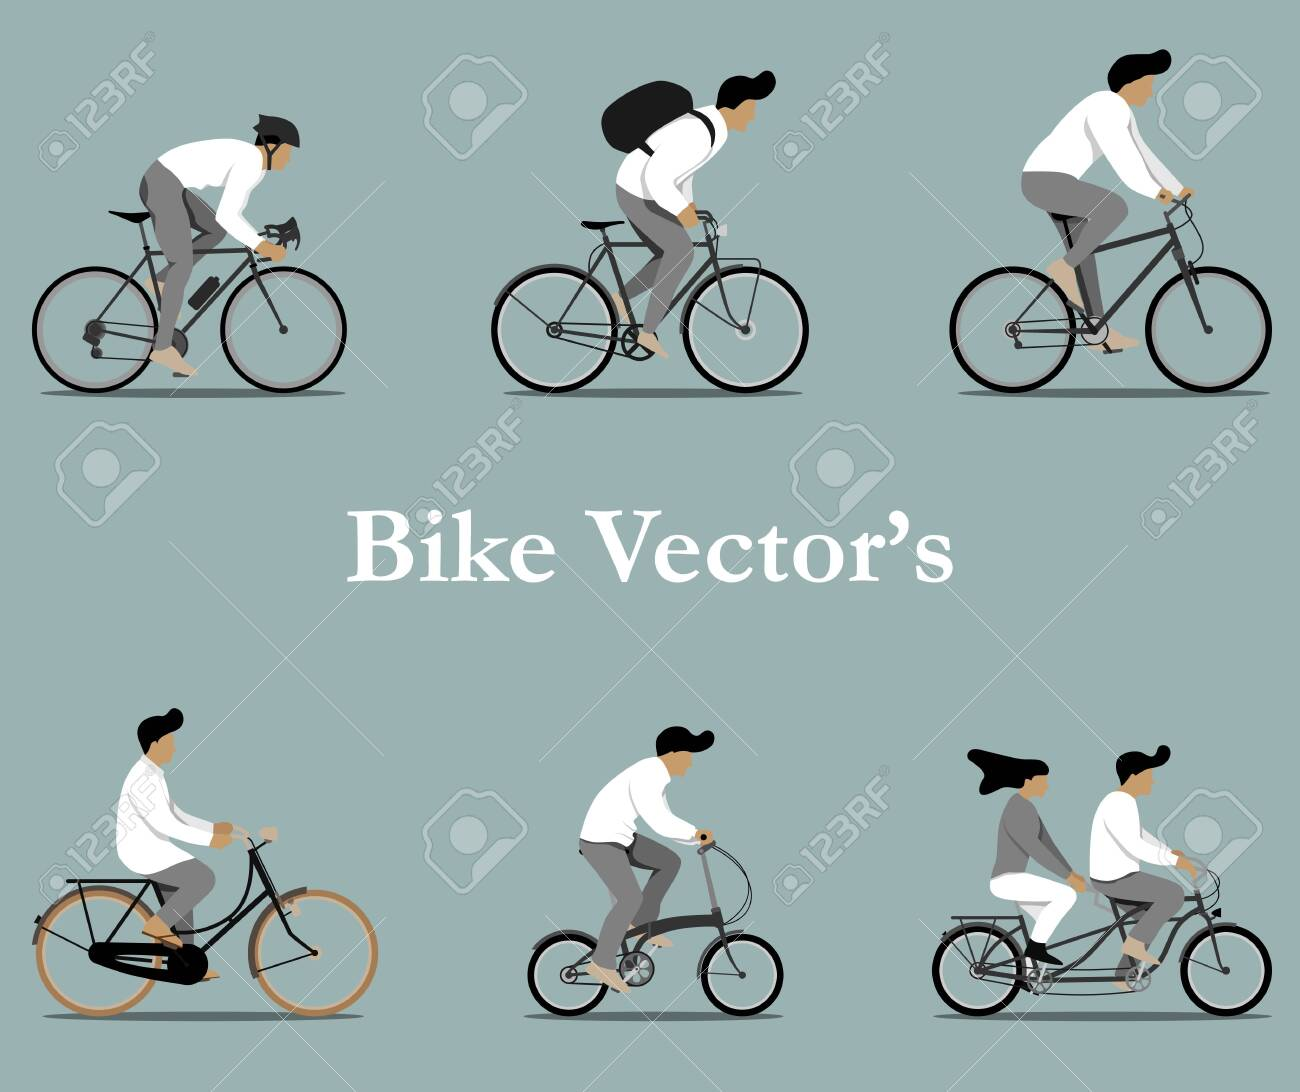 Set of various bicycles vectors in flat design. - 152951002